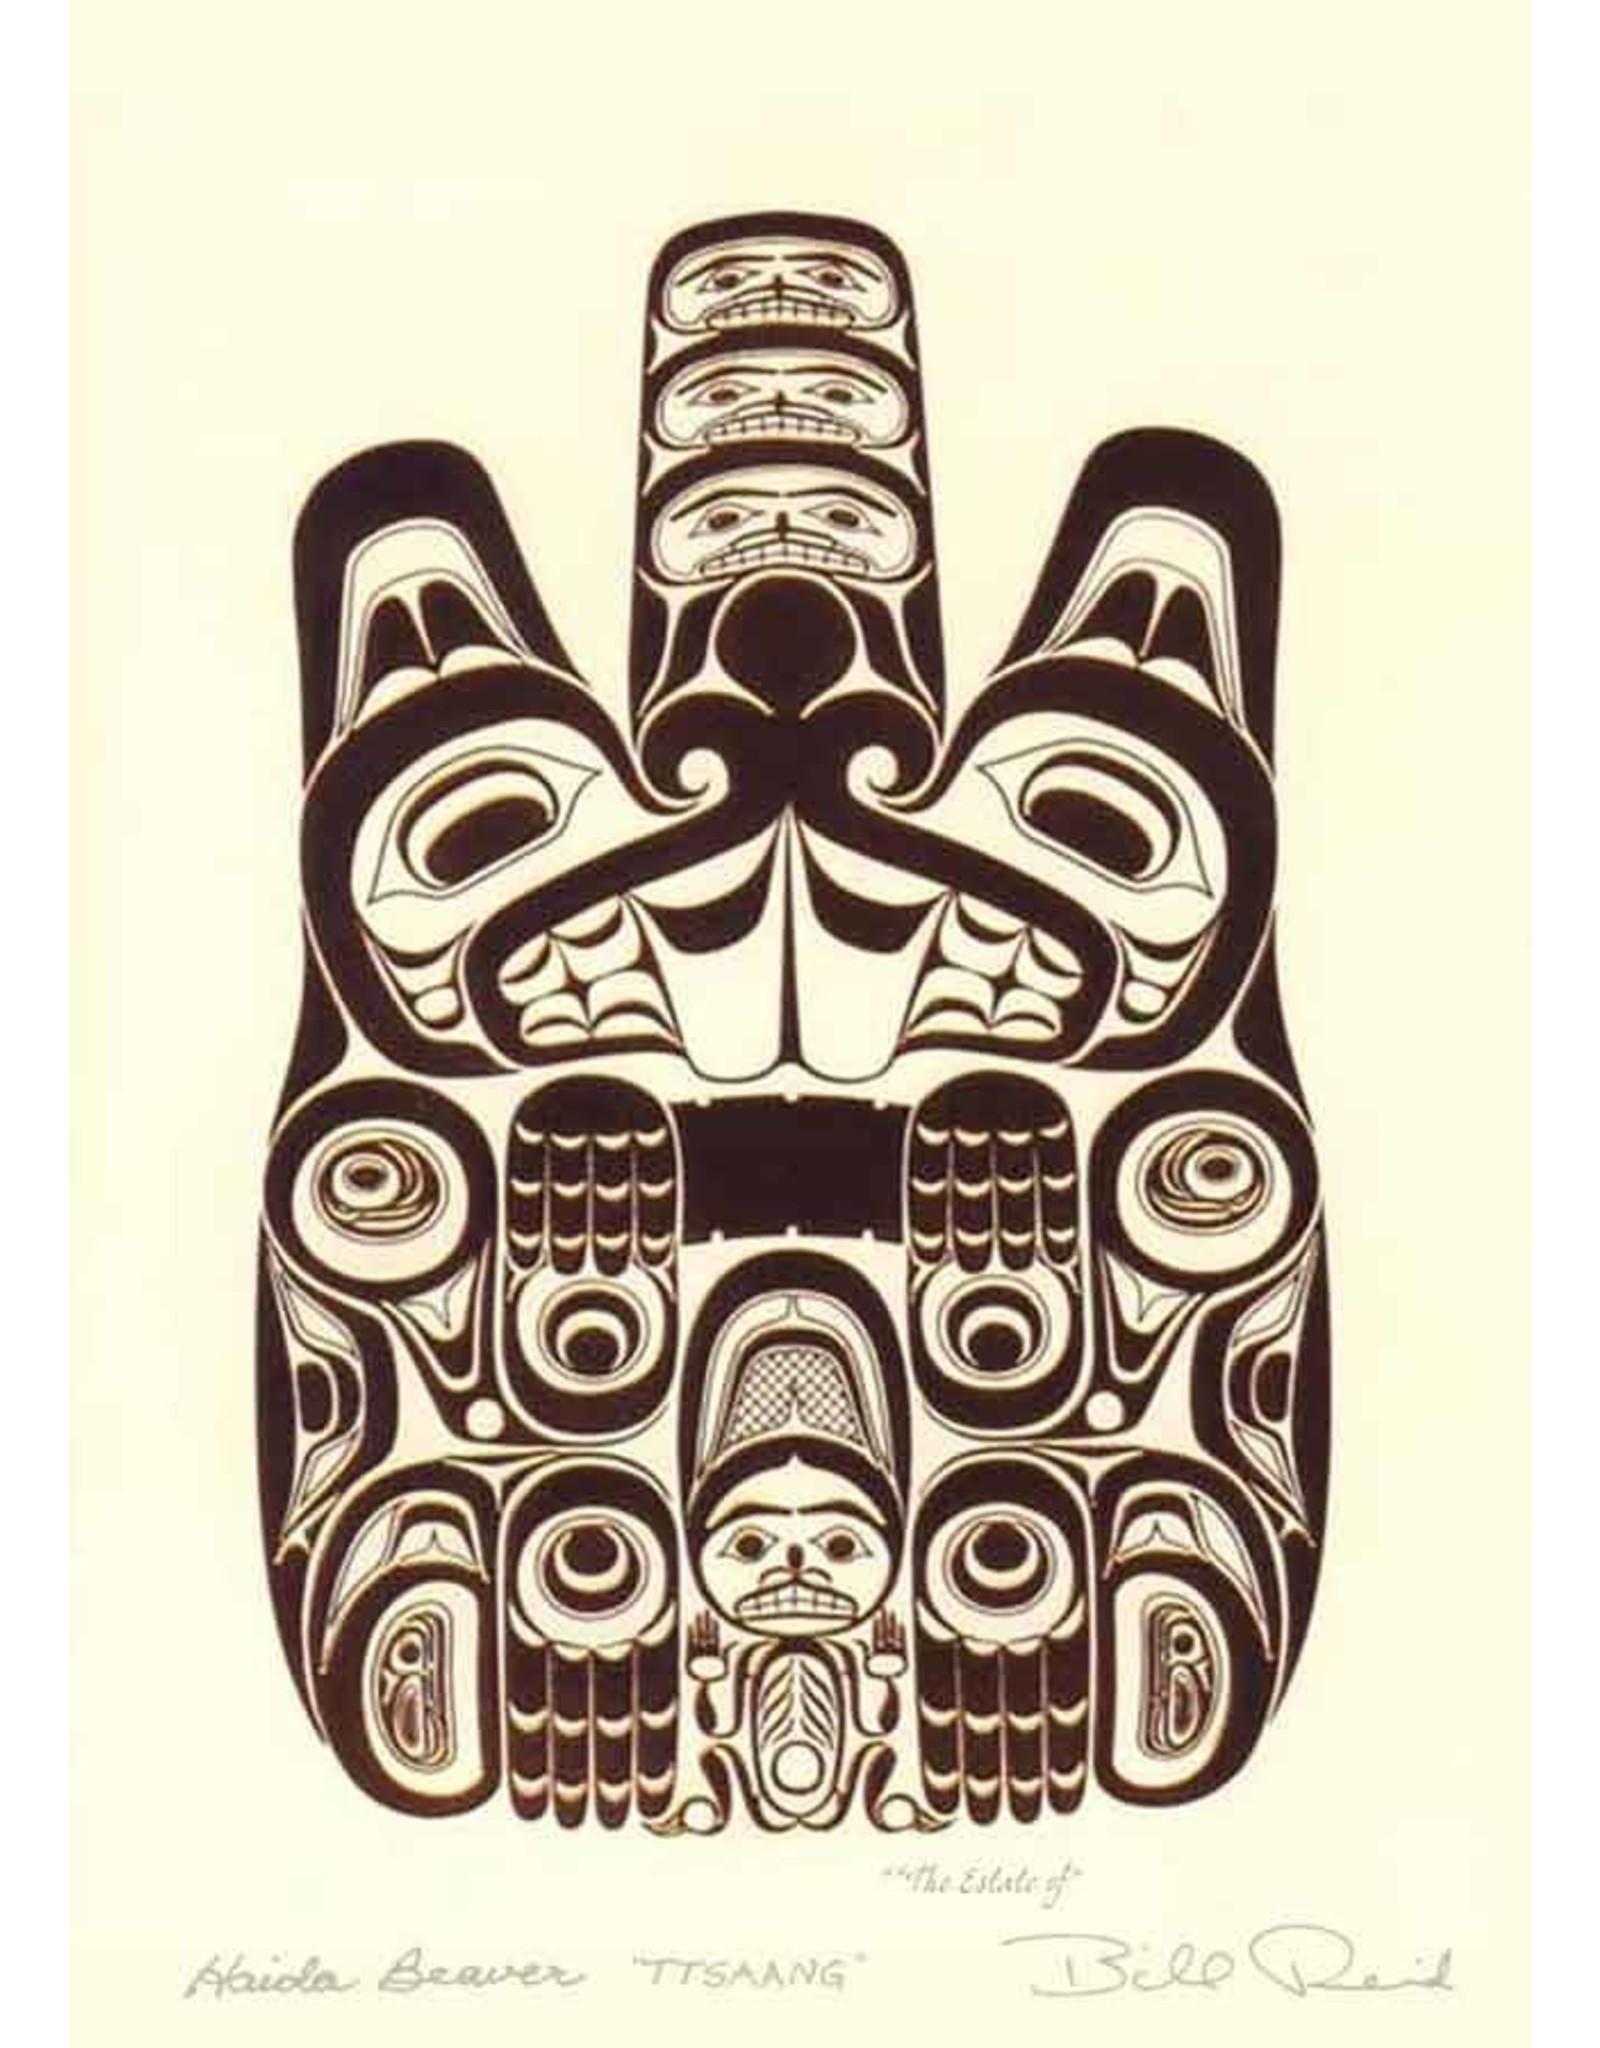 Haida Beaver - TTSAANG par Bill Reid 7442 Encadrée